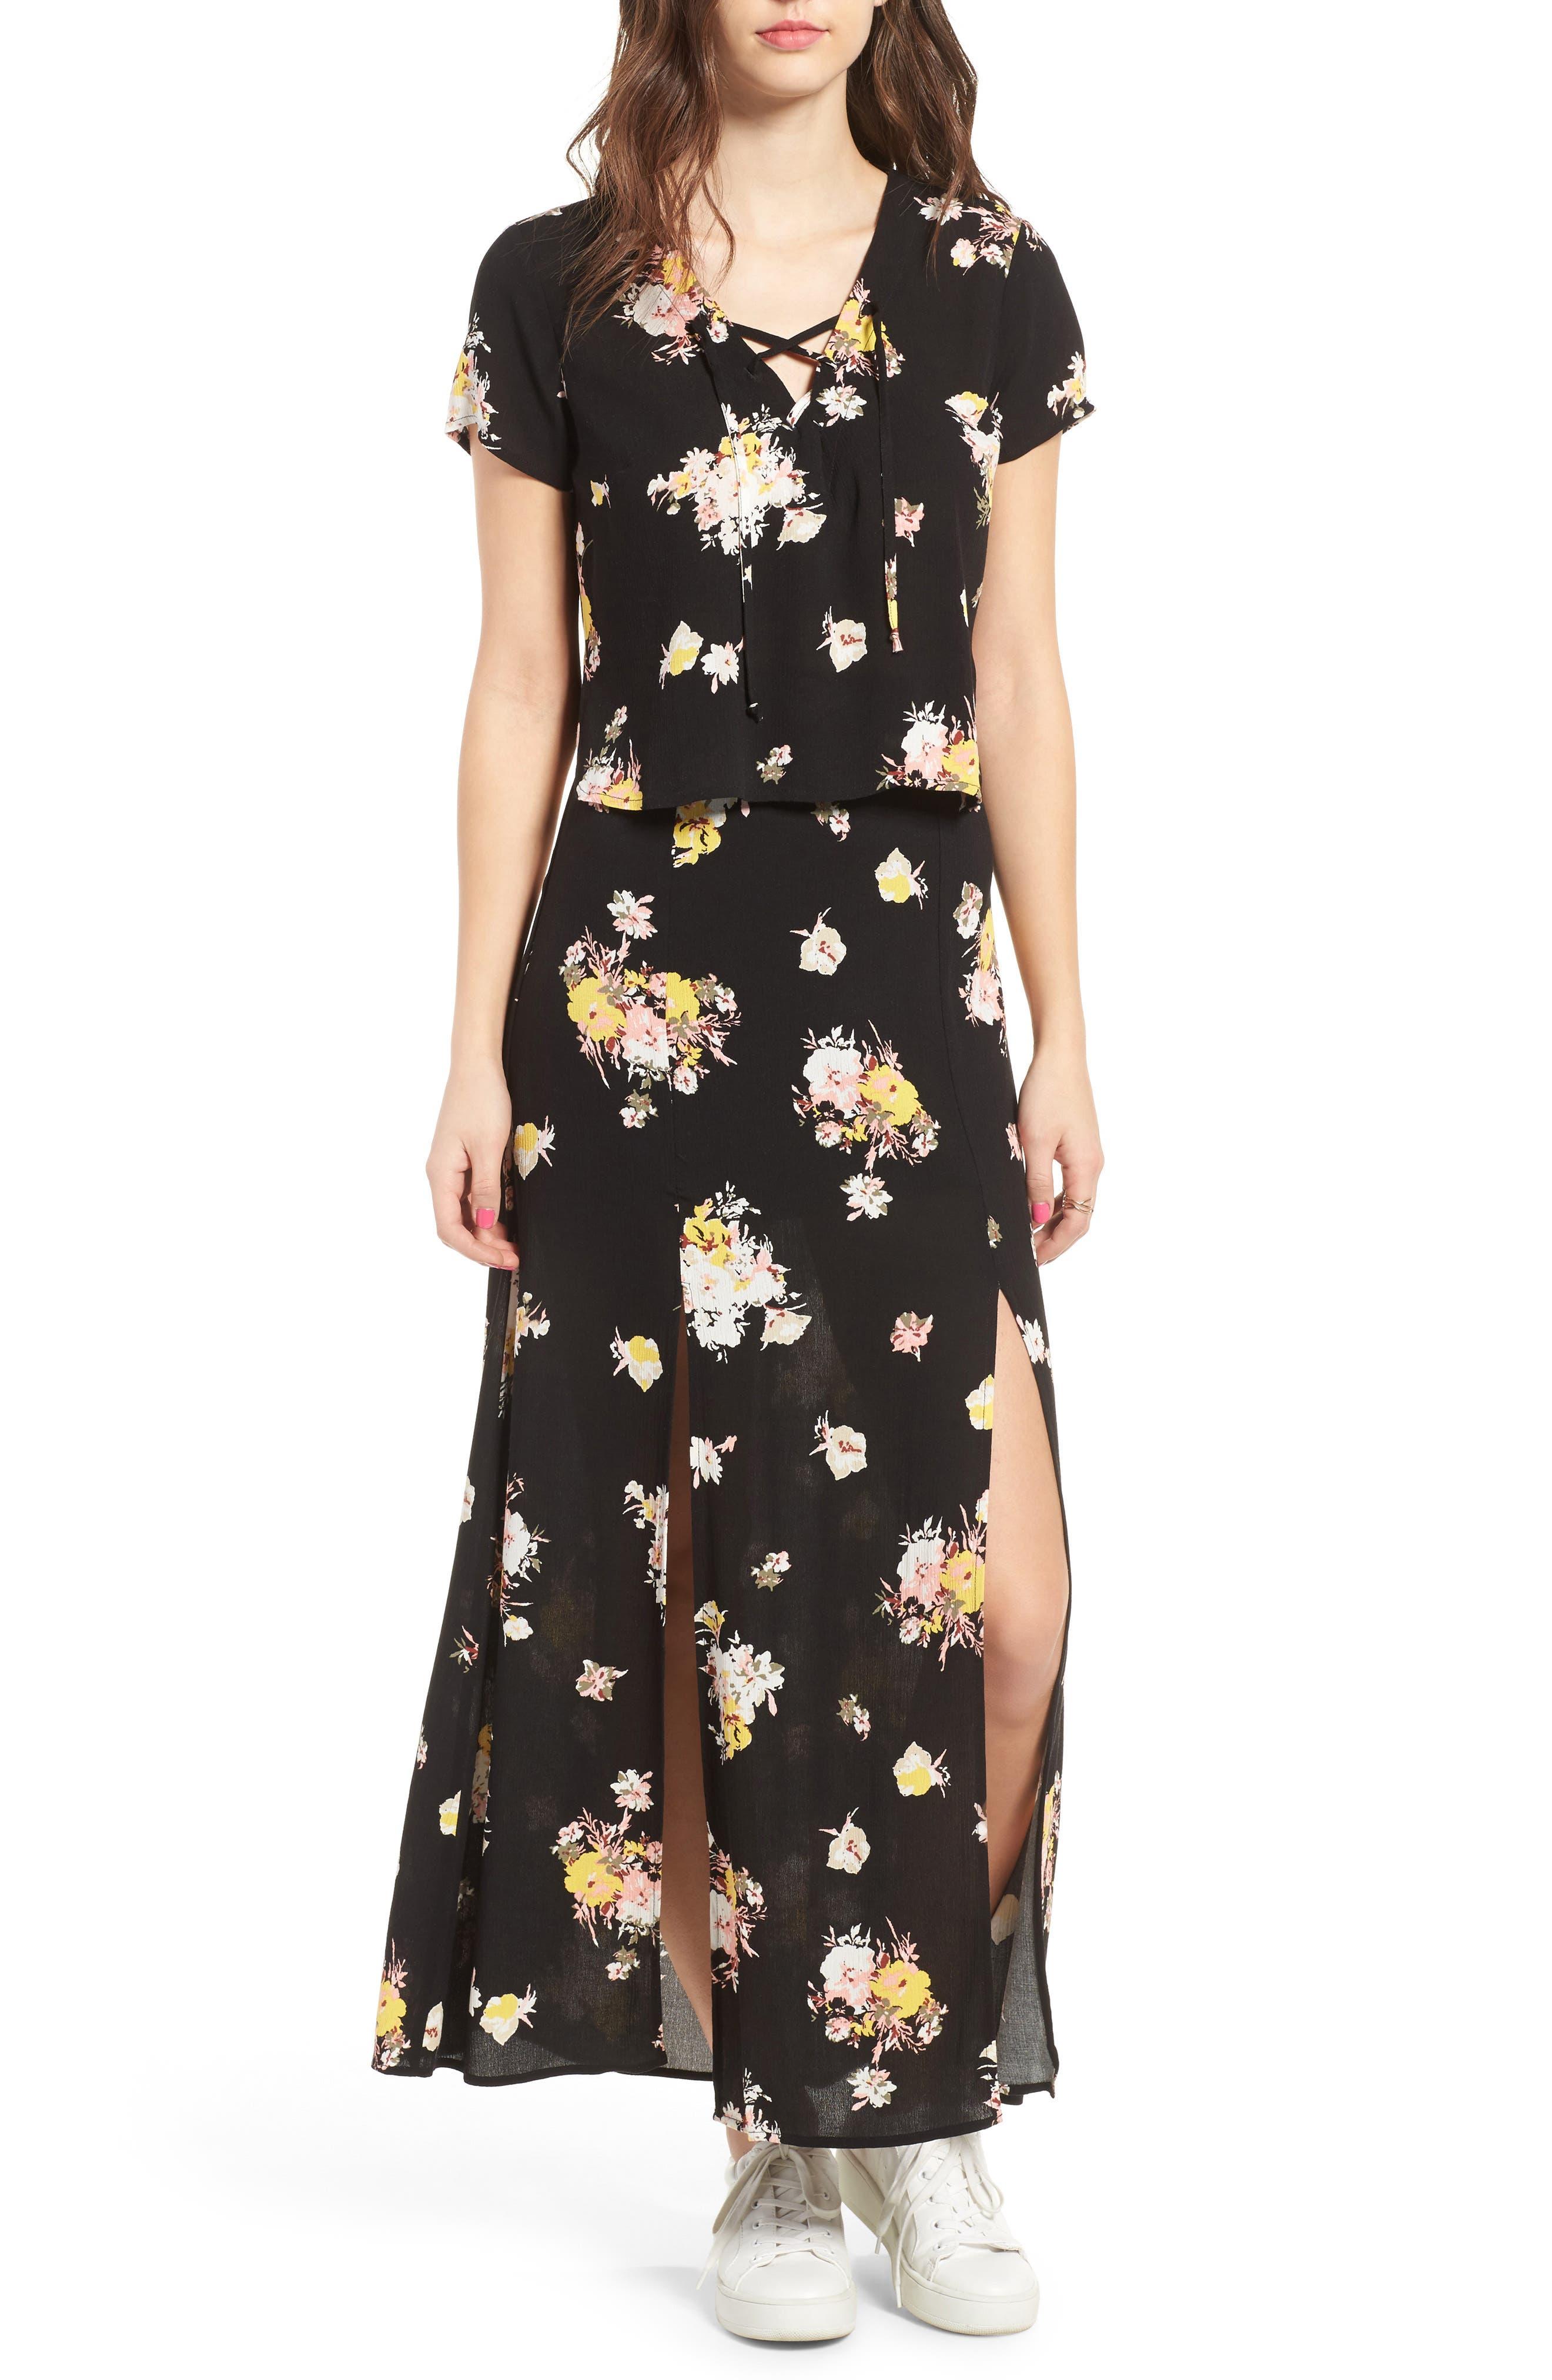 Coordinating Lace-Up Crop Top,                             Alternate thumbnail 2, color,                             Black Blush Floral